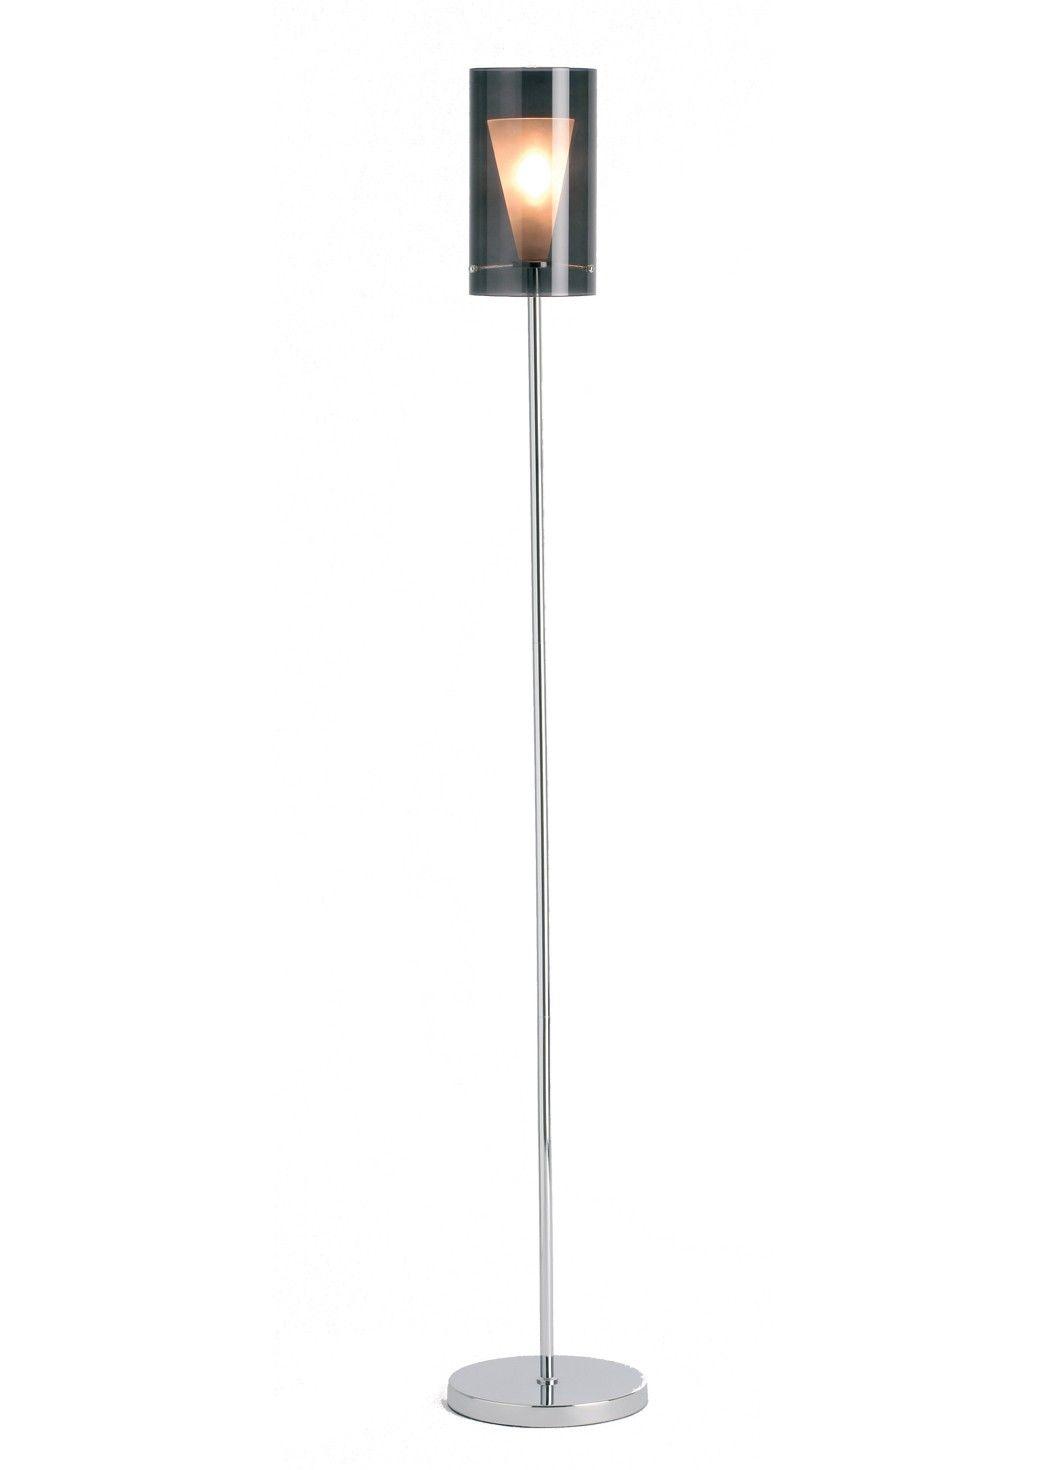 Dakota Floor Lamp Smoked From Pagazzi Lighting House Shortlist within sizing 1050 X 1470